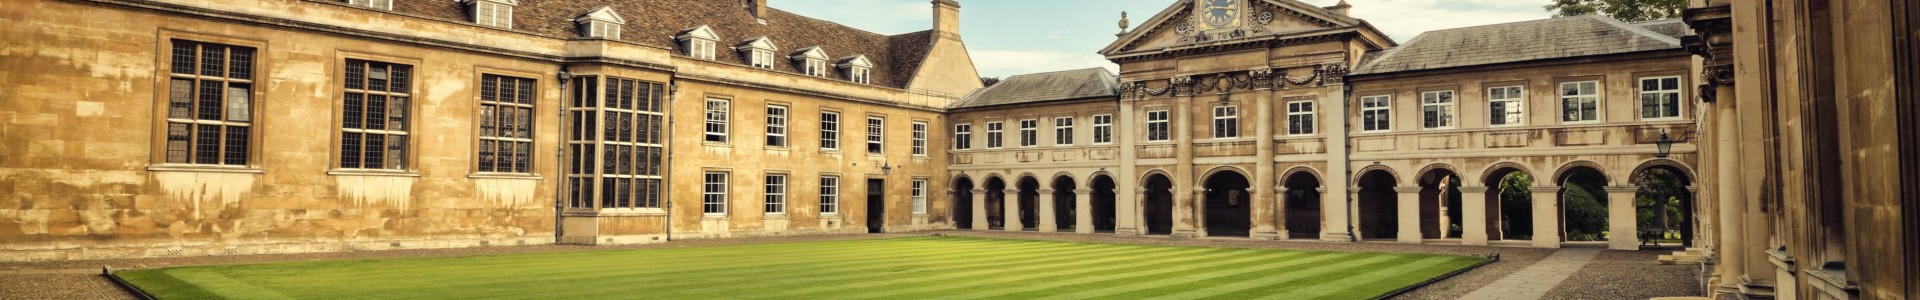 A university.